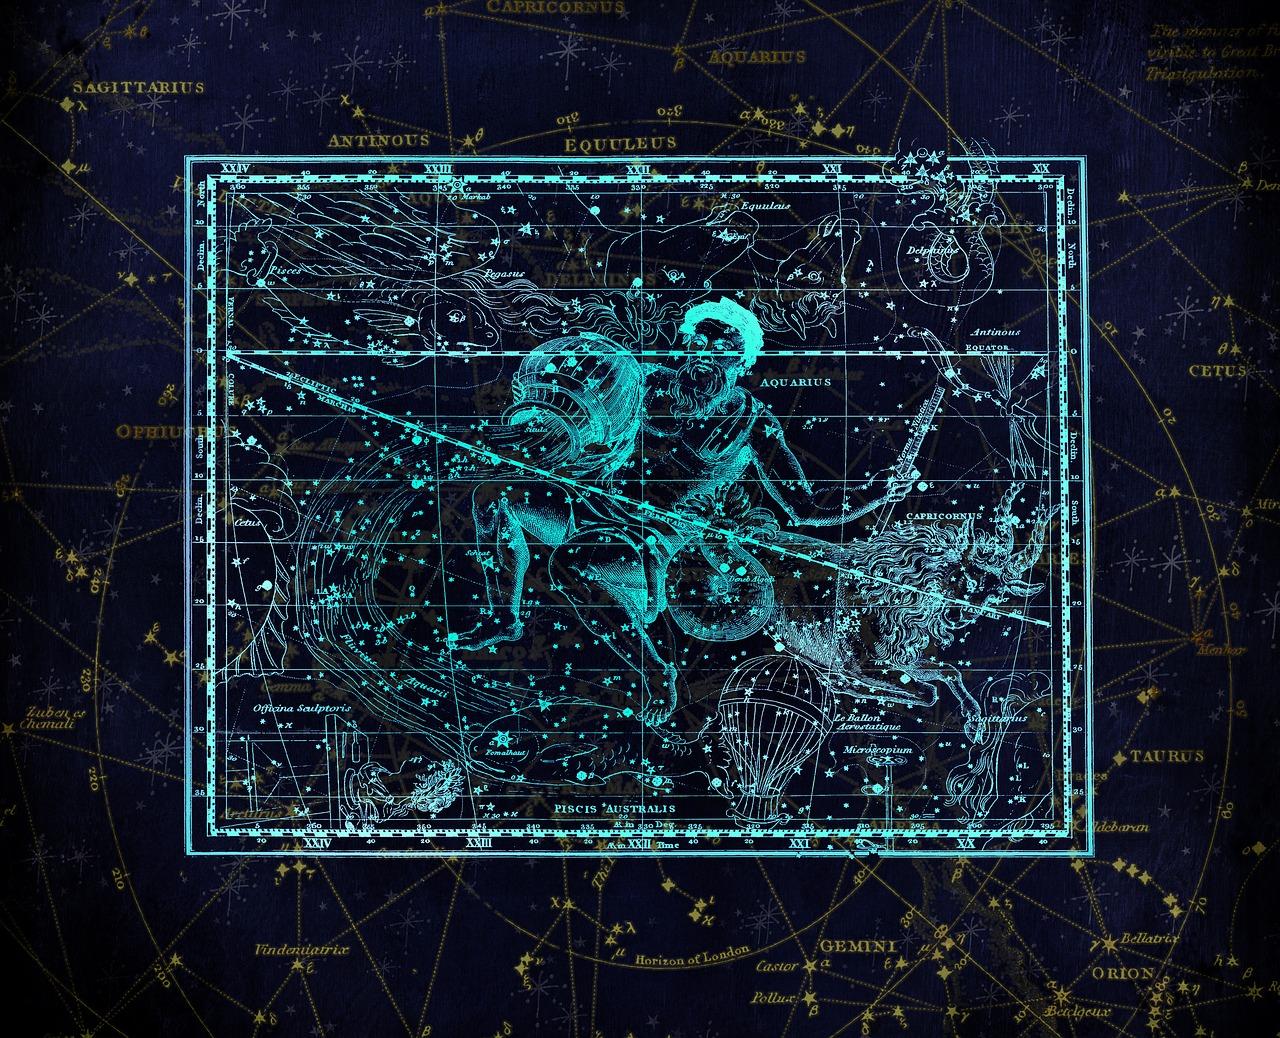 Capricorn 2013: Your Personal Horoscope